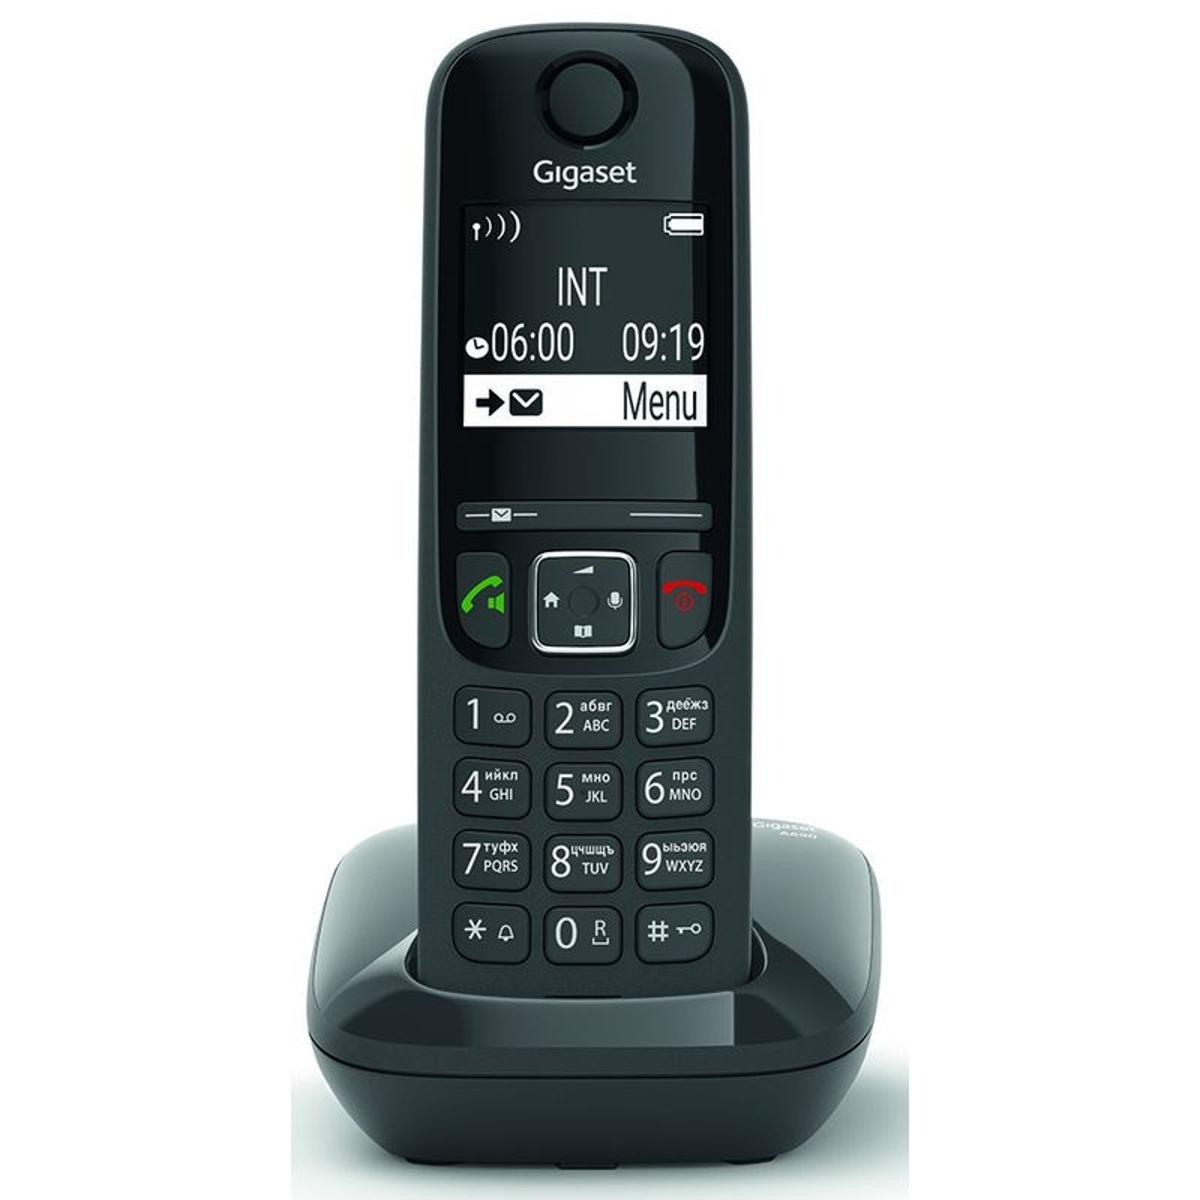 Telephones sans fil GIGASET SIEMENS GIGA AS 690 NOIR - GIGA AS 690 NOIR